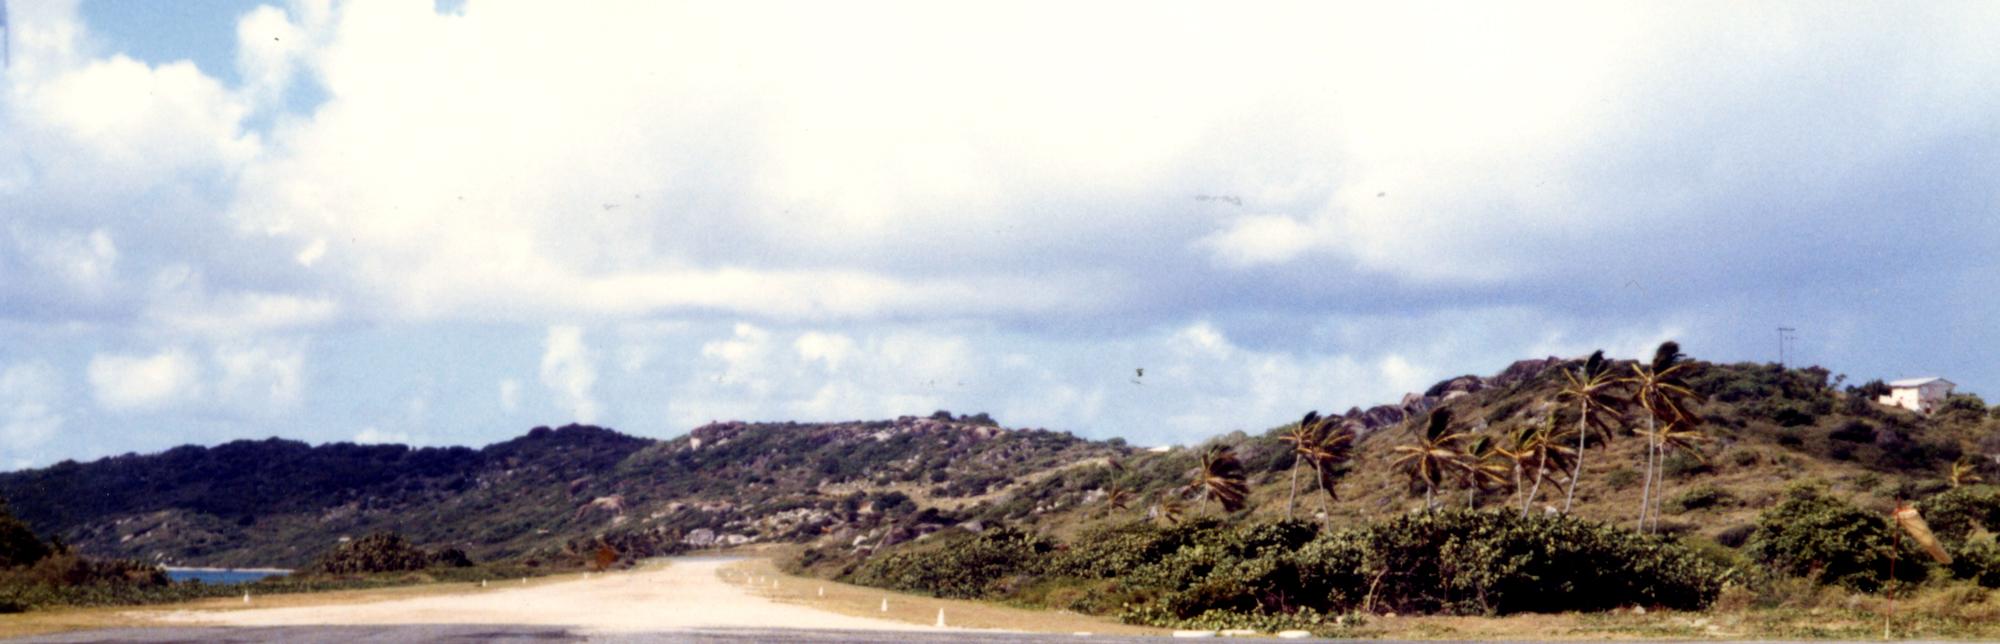 Virgin Gorda's Crushed-Shell Runway